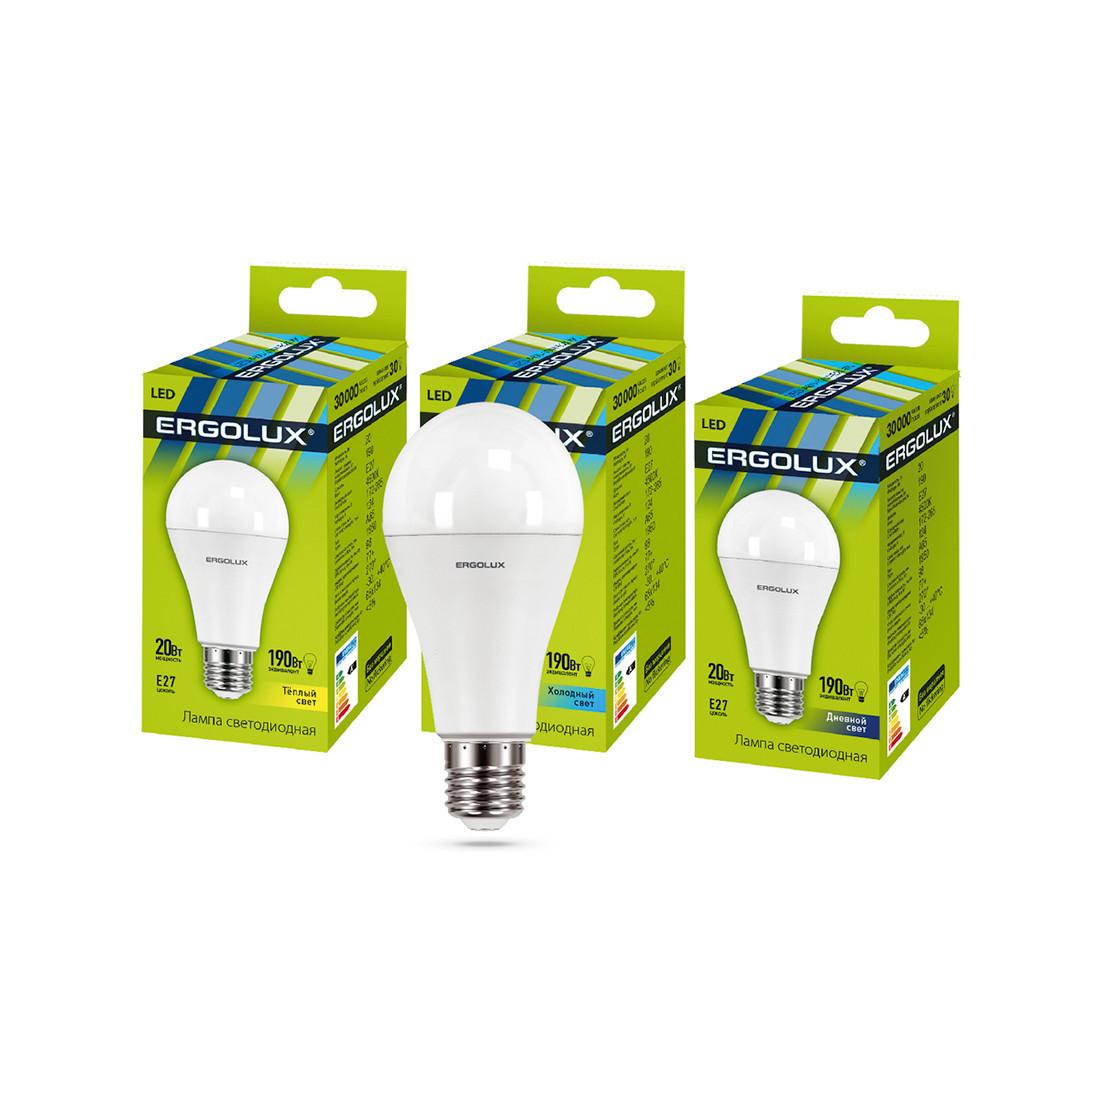 Эл. лампа светодиодная Ergolux LED-A65-20W-E27-6K ЛОН Дневной